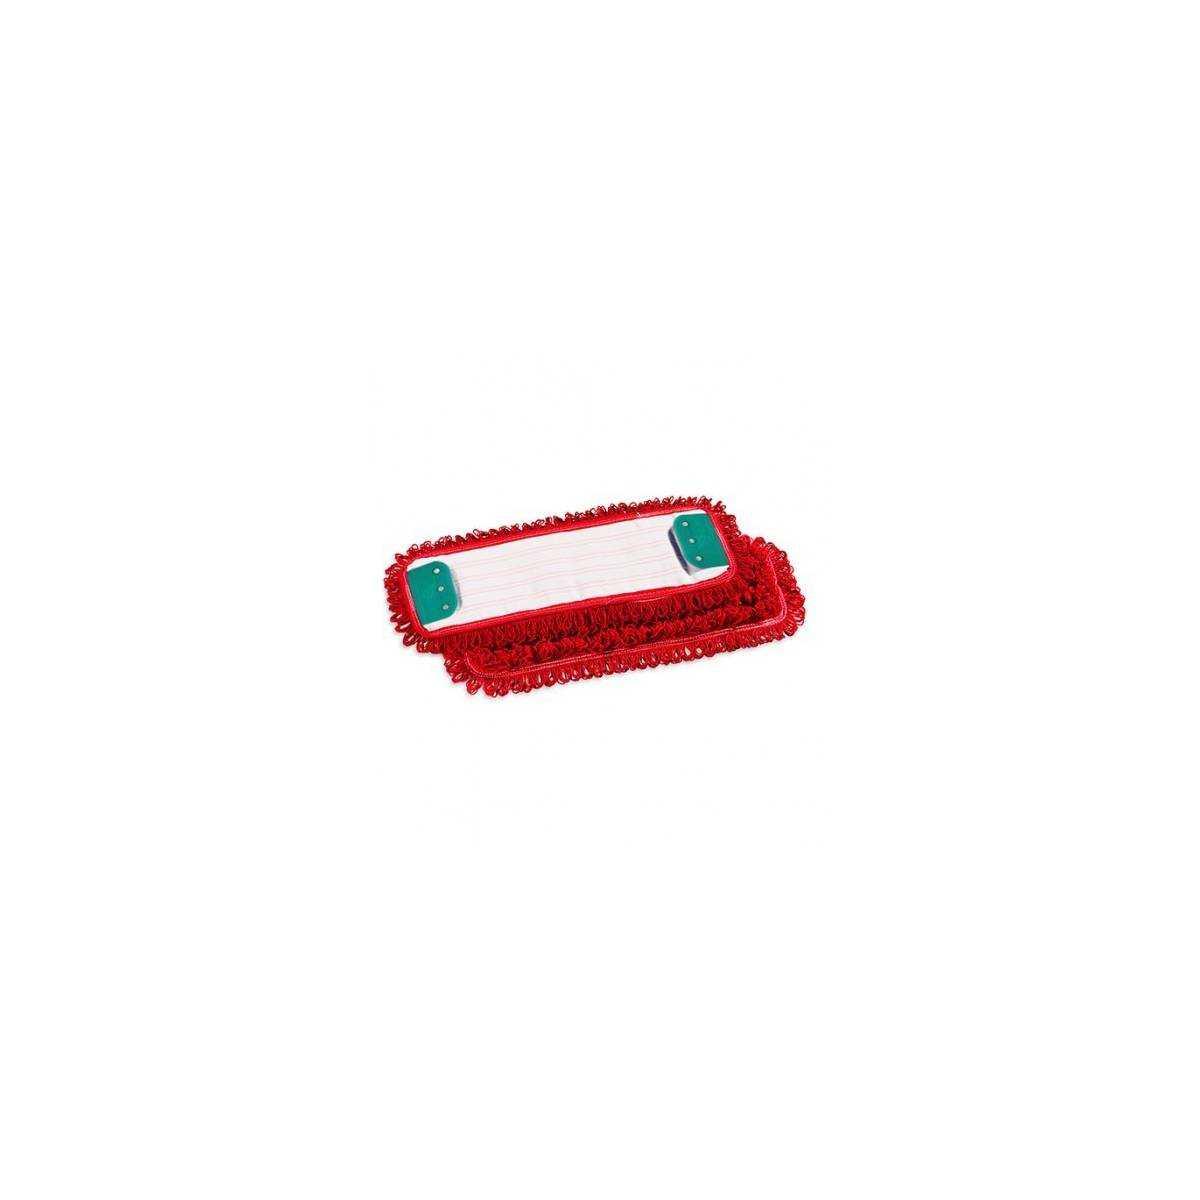 Моп Microriccio Wet System микрофибра 40см (Красный цвет) 0R000694MR TTS